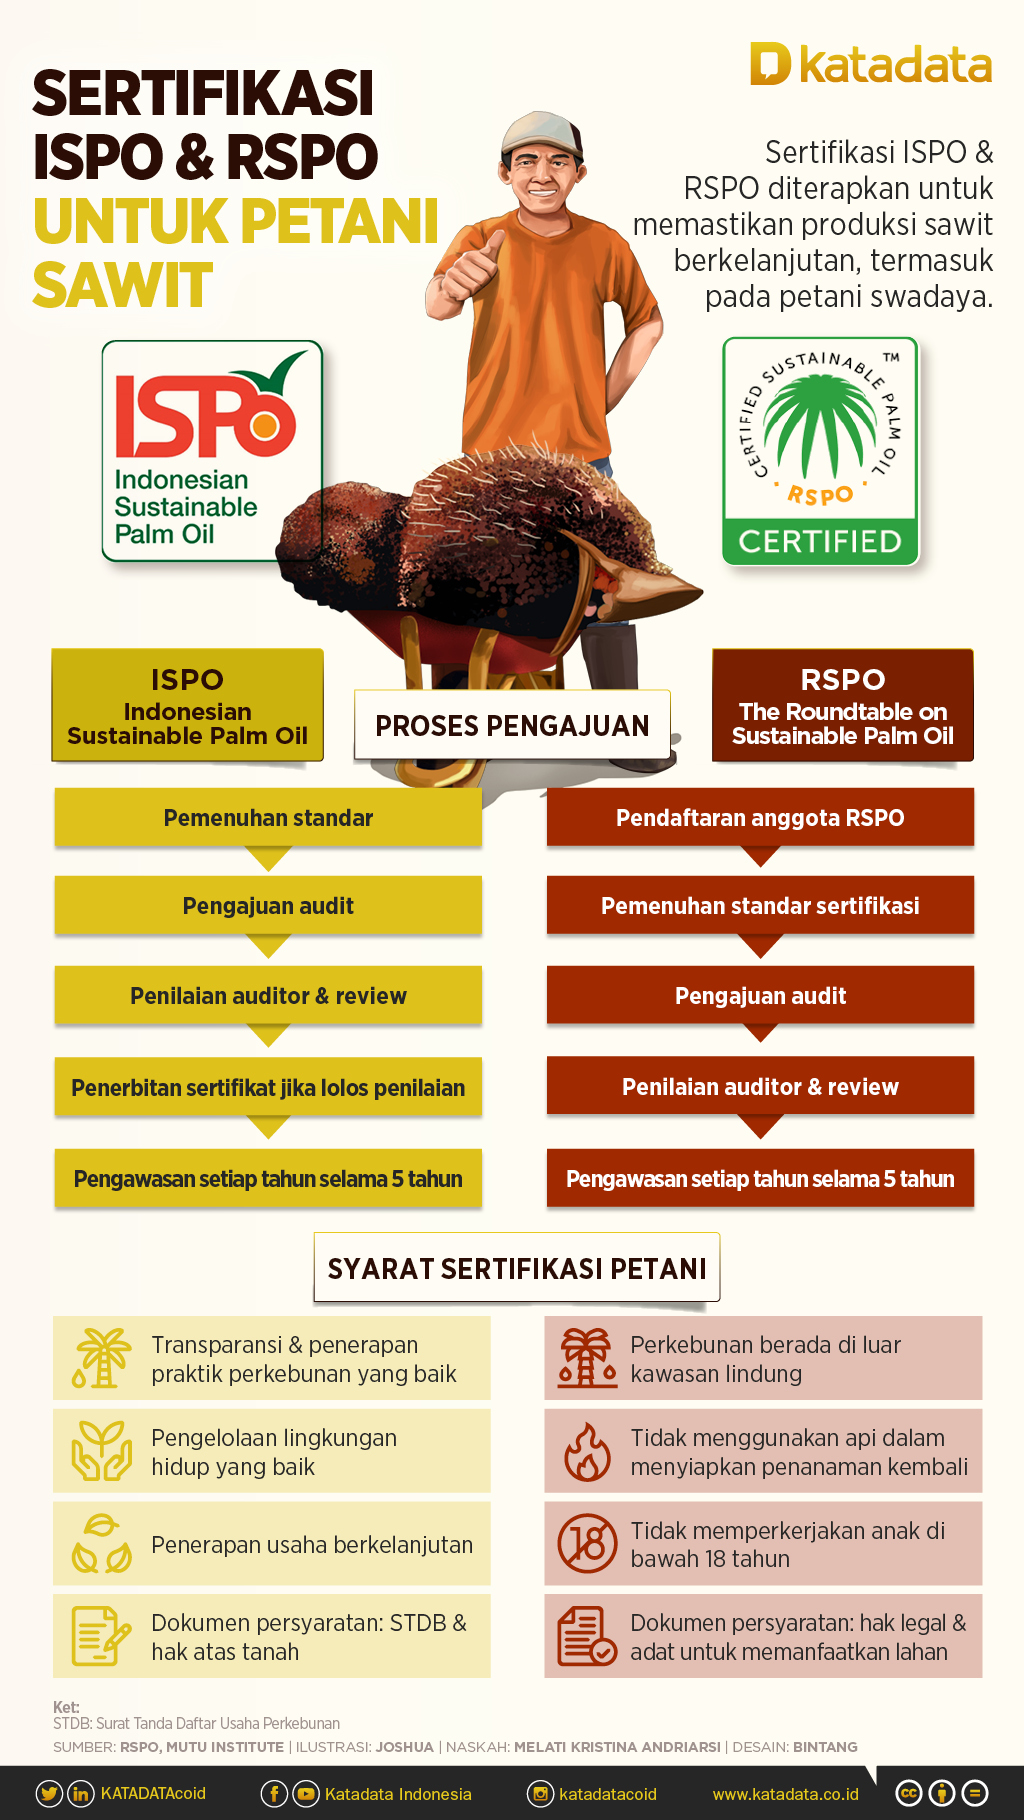 Infografik_Sertifikasi ISPO & RSPO untuk Petani Sawit